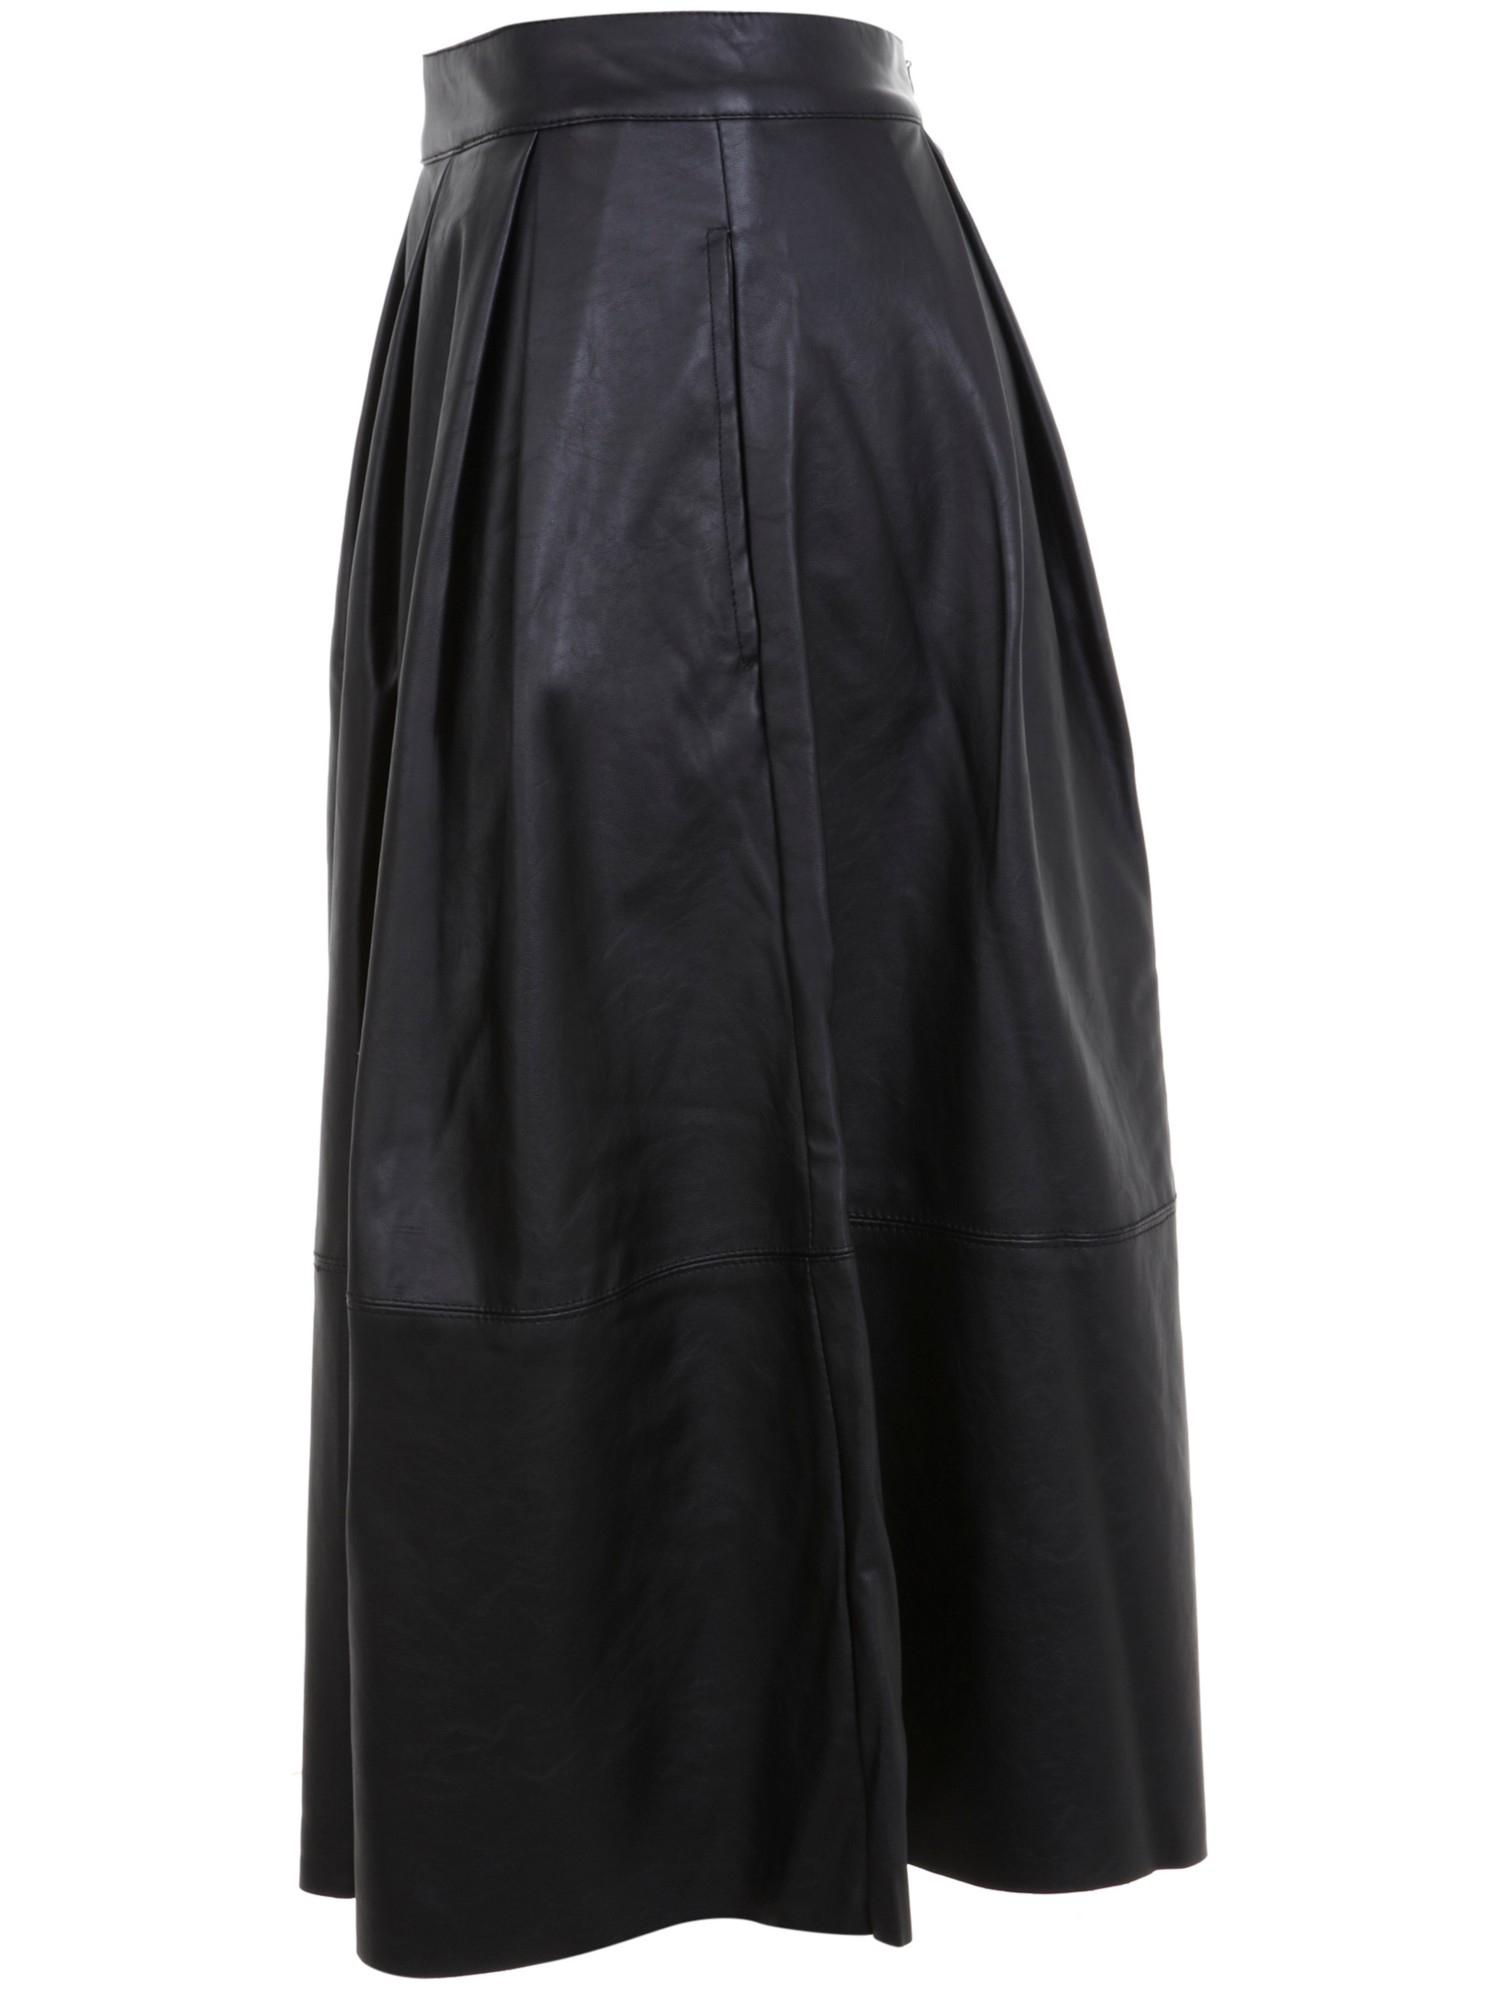 miss selfridge leather look midi skirt in black lyst